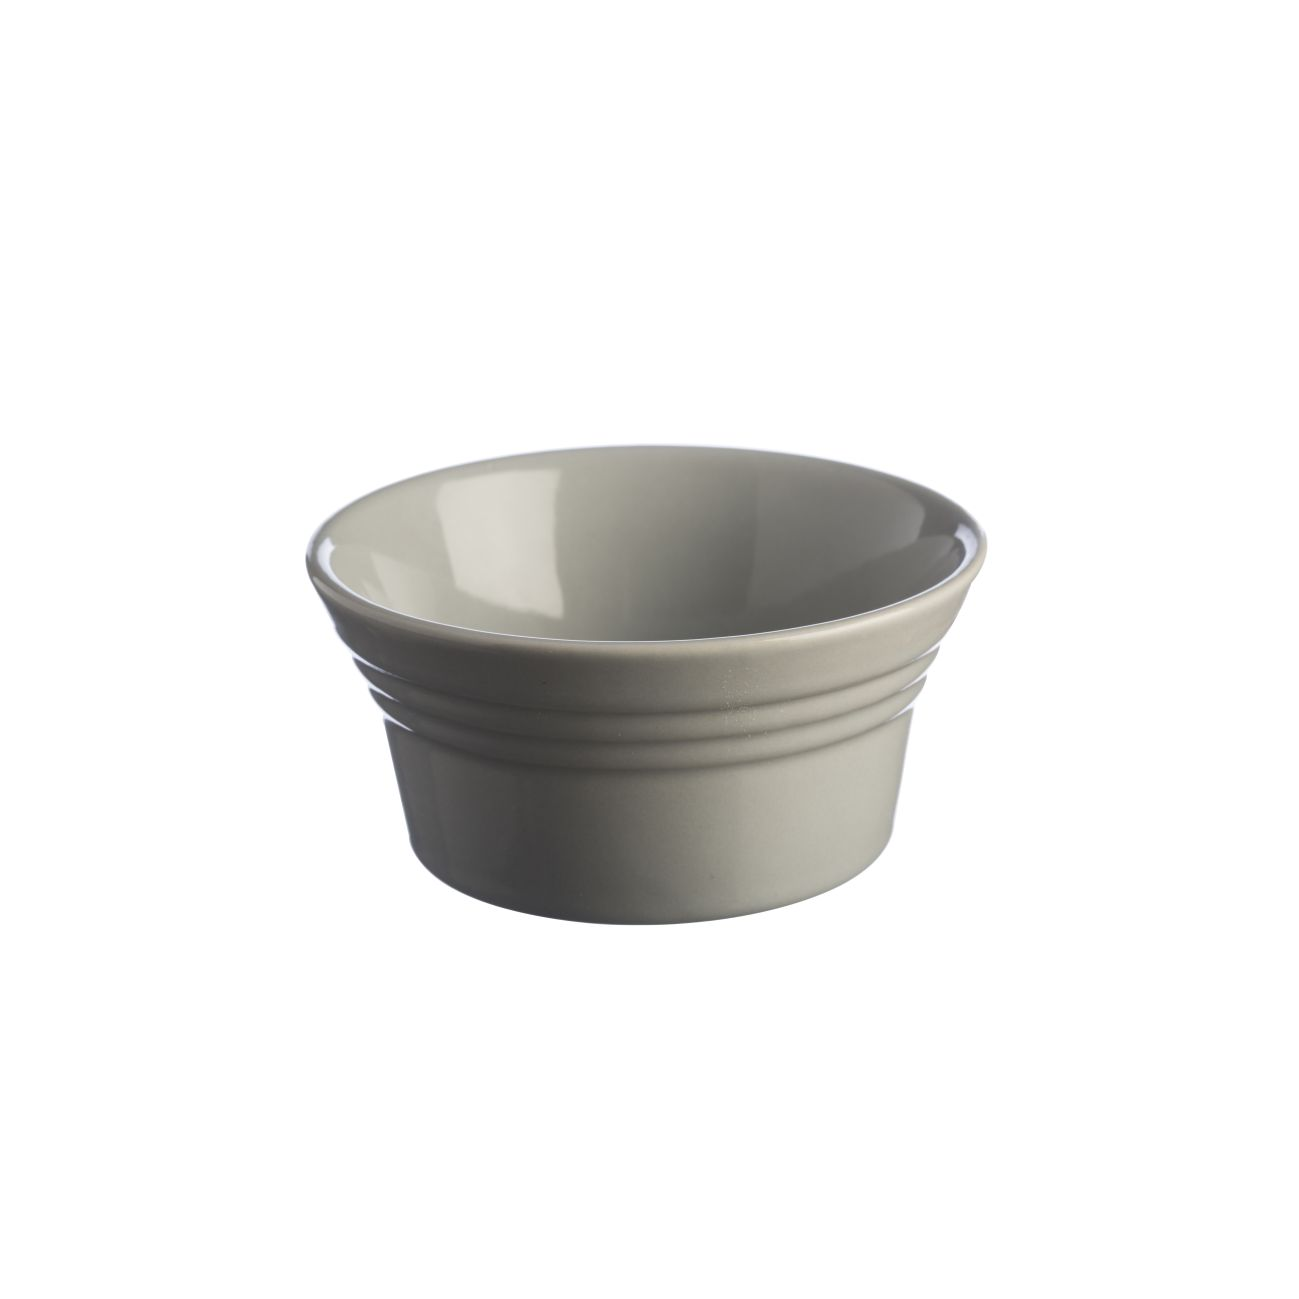 Zapékací miska ramekin Grey 9,5 cm - 175ml Classic Kitchen - Mason Cash